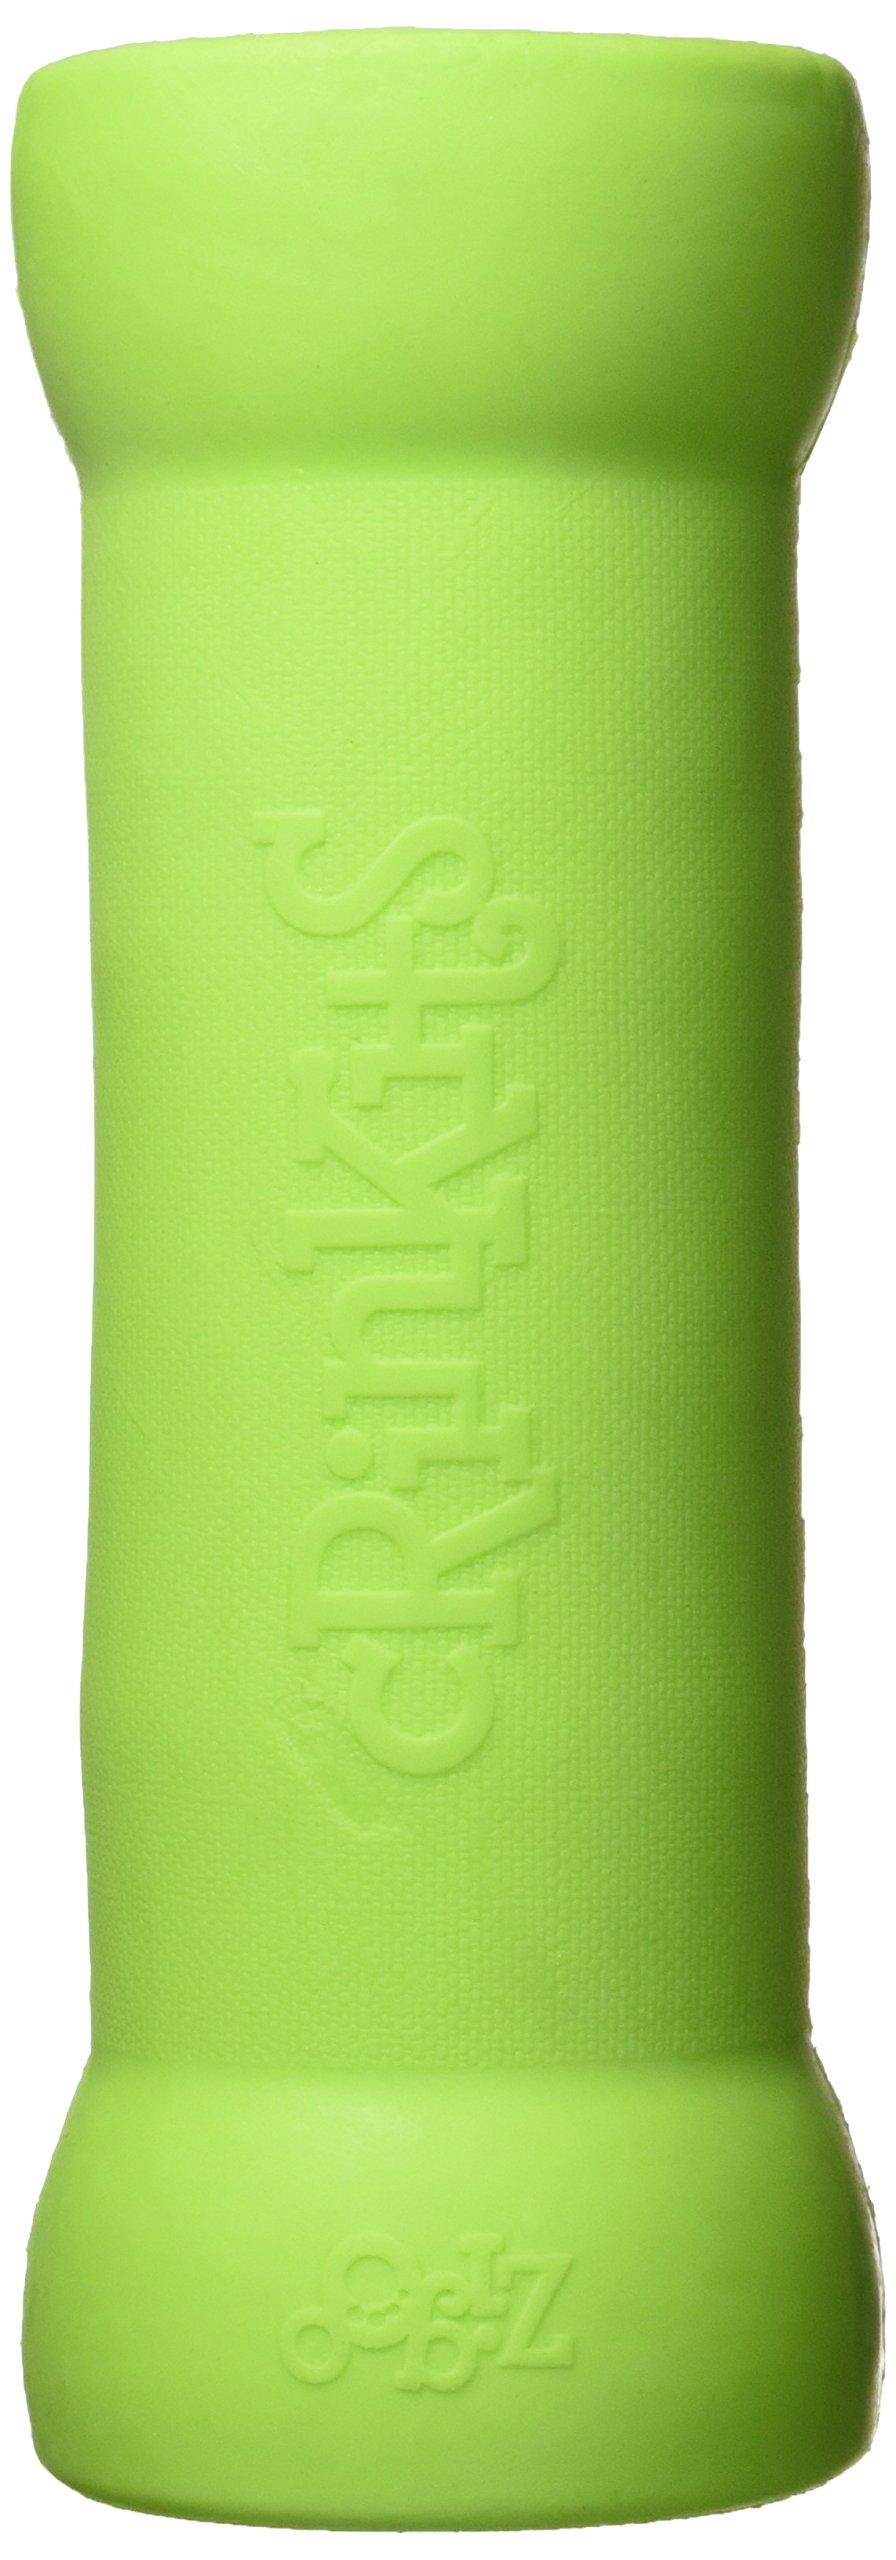 Crinkit Water Bottle Toy, 9-Inch, 16.9 oz, Green